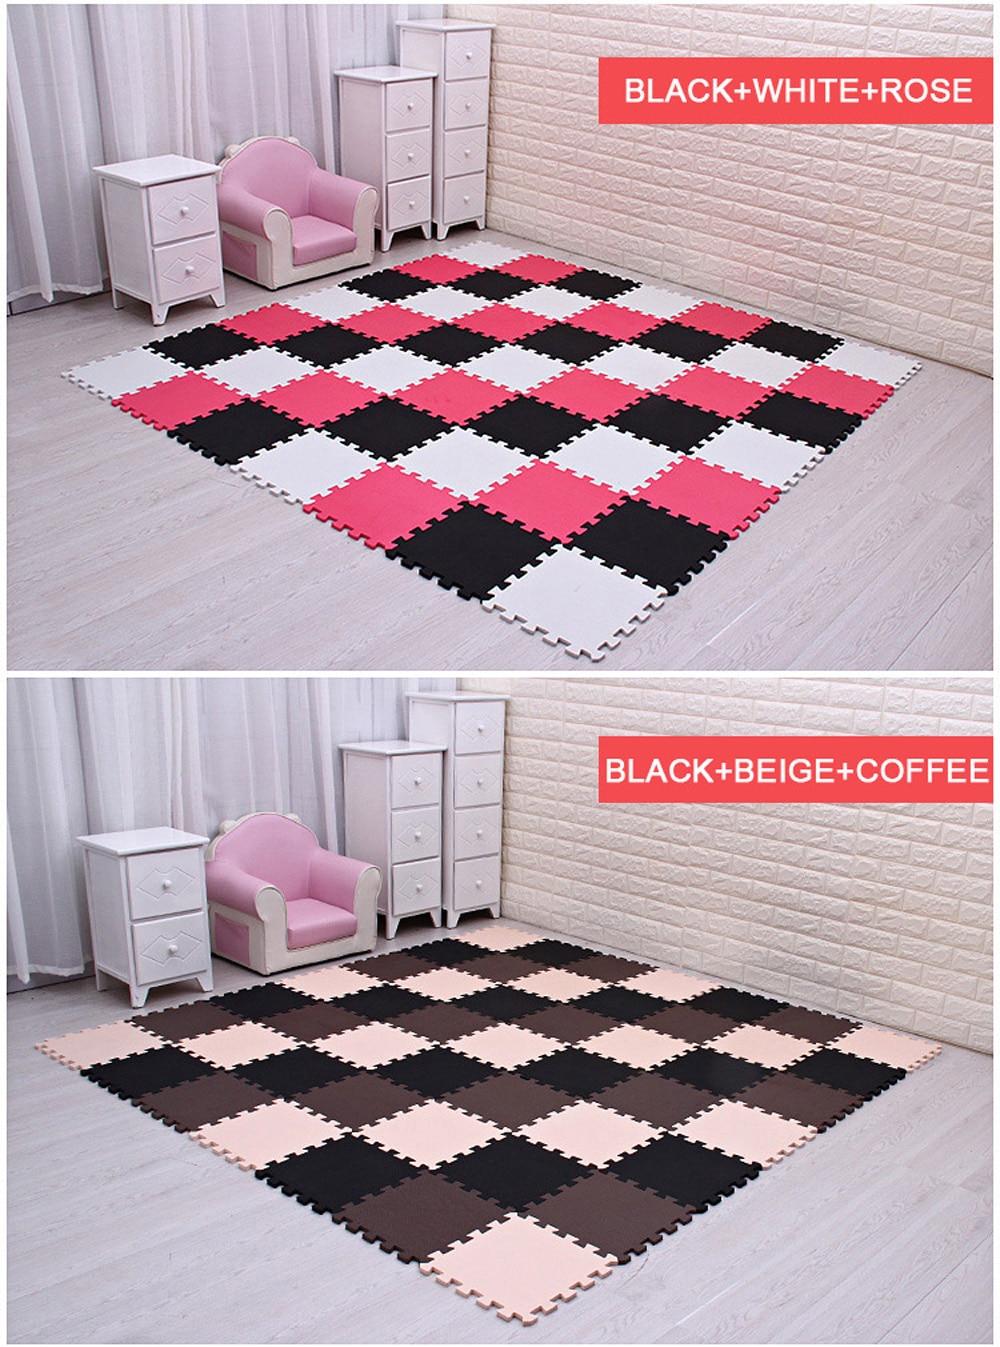 HTB1JWC5jC8YBeNkSnb4q6yevFXaa Newest 9/18pcs/set EVA Children's Foam Carpet Mosaic floor Puzzle Carpet Baby Play Mat Floor Developing Crawling Rugs Puzzle Mat